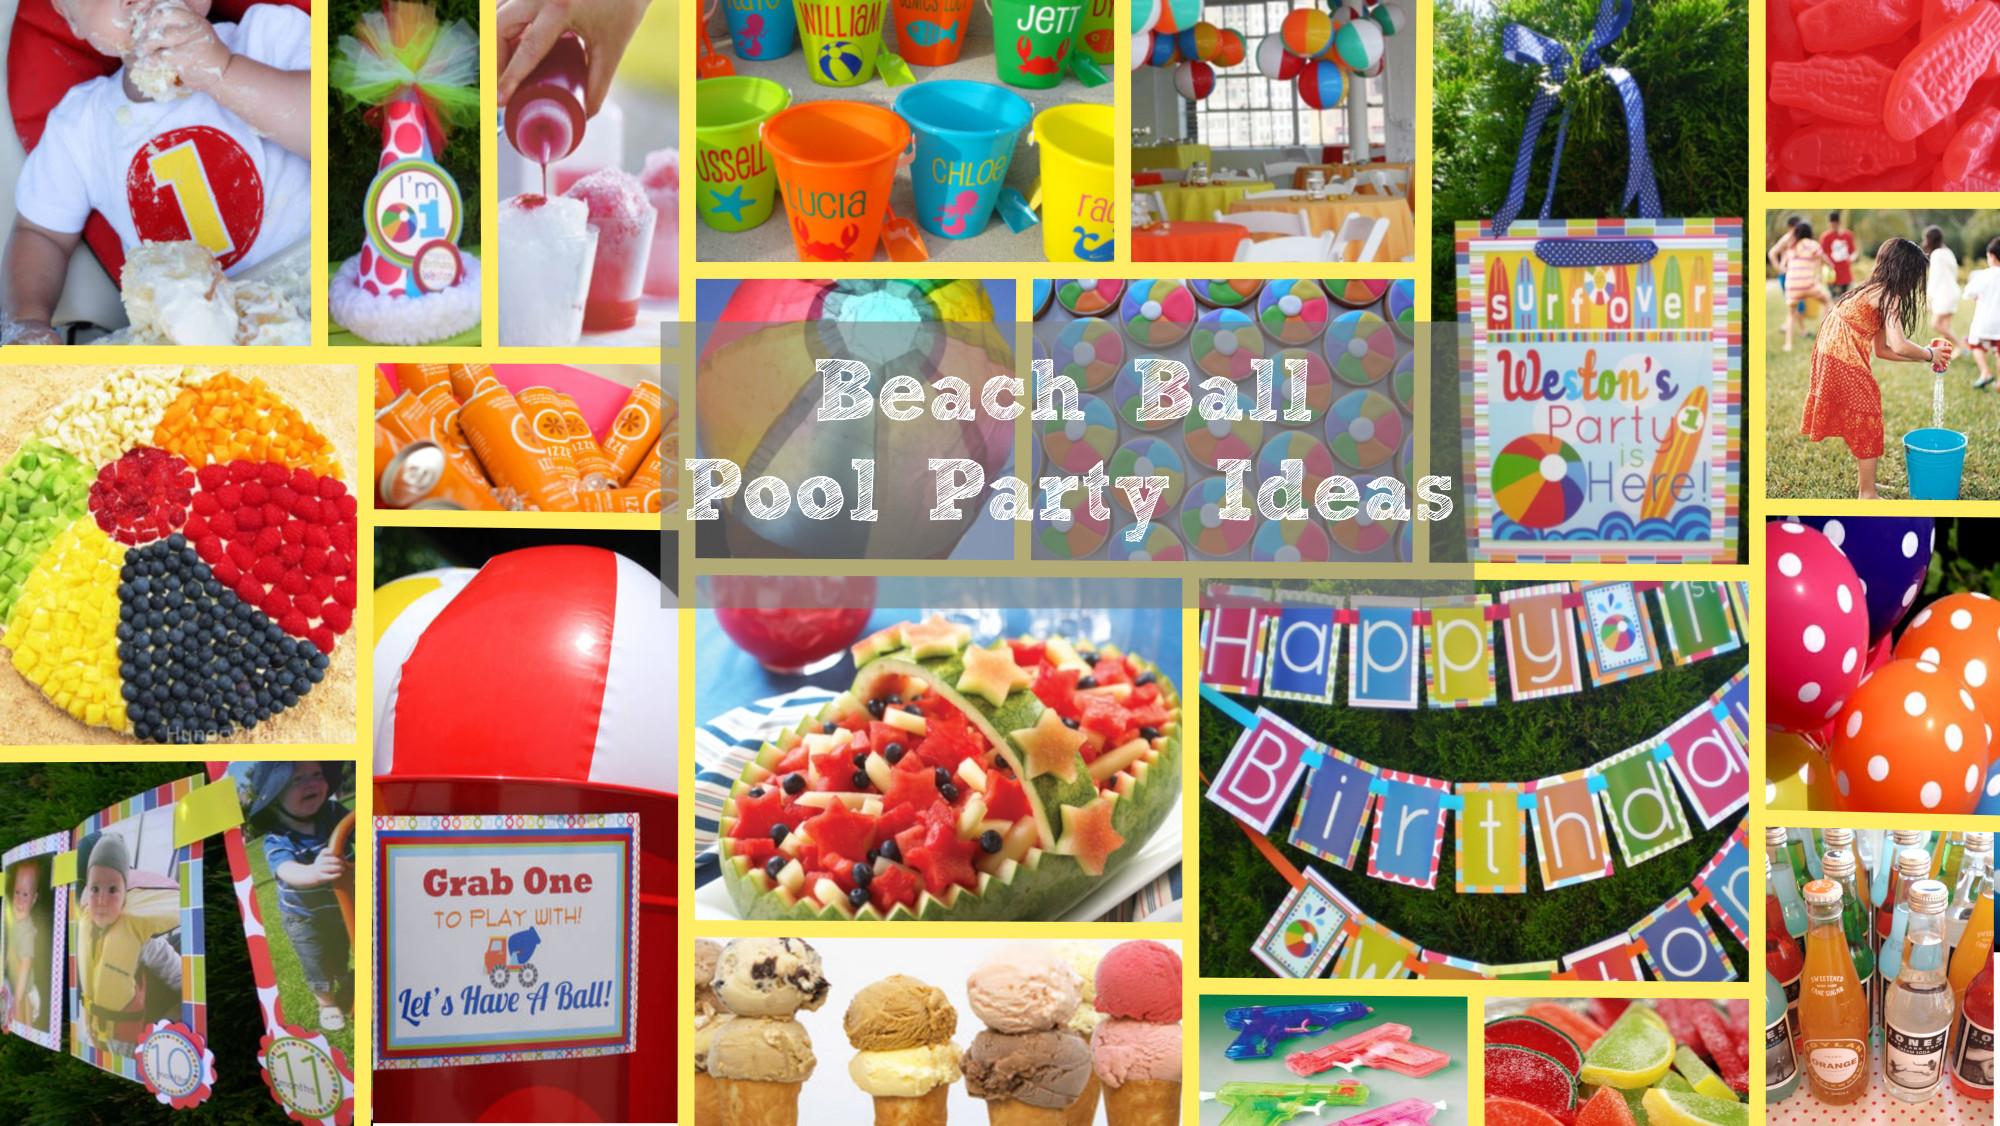 Beach Ball Pool Party Ideas  Beach Ball Party Ideas inspiration board